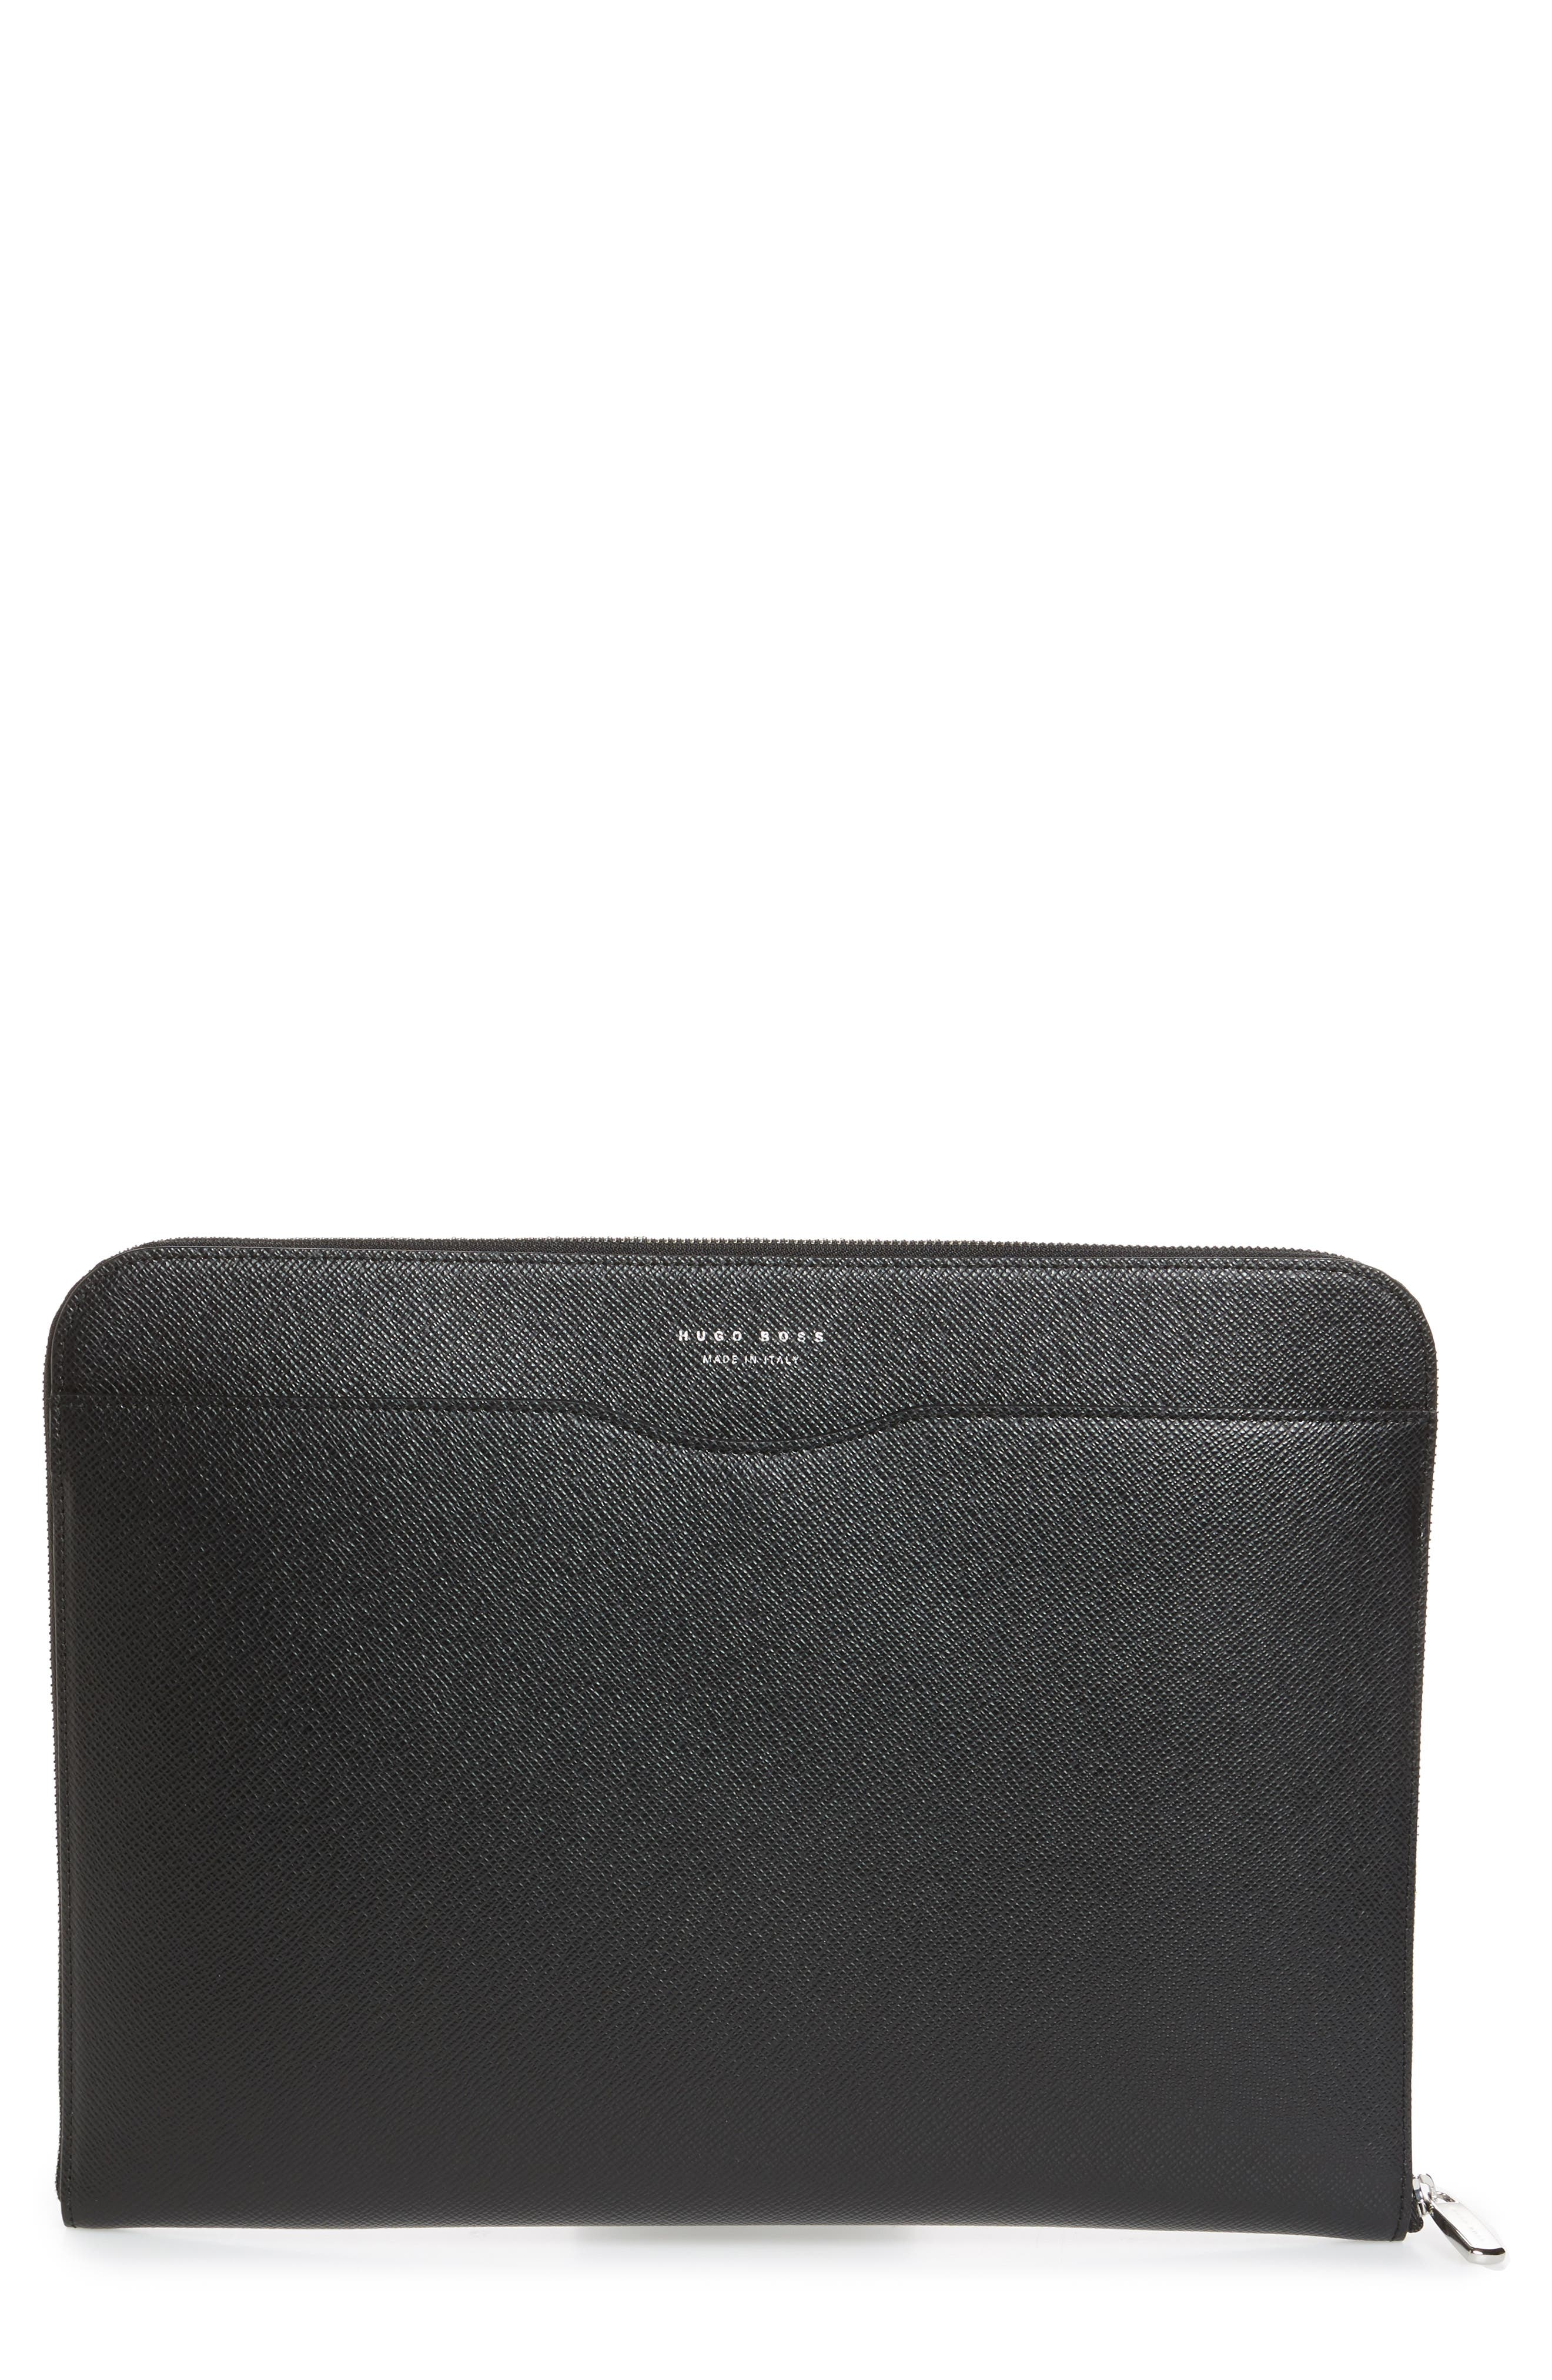 Signature Leather Portfolio,                             Main thumbnail 1, color,                             Black